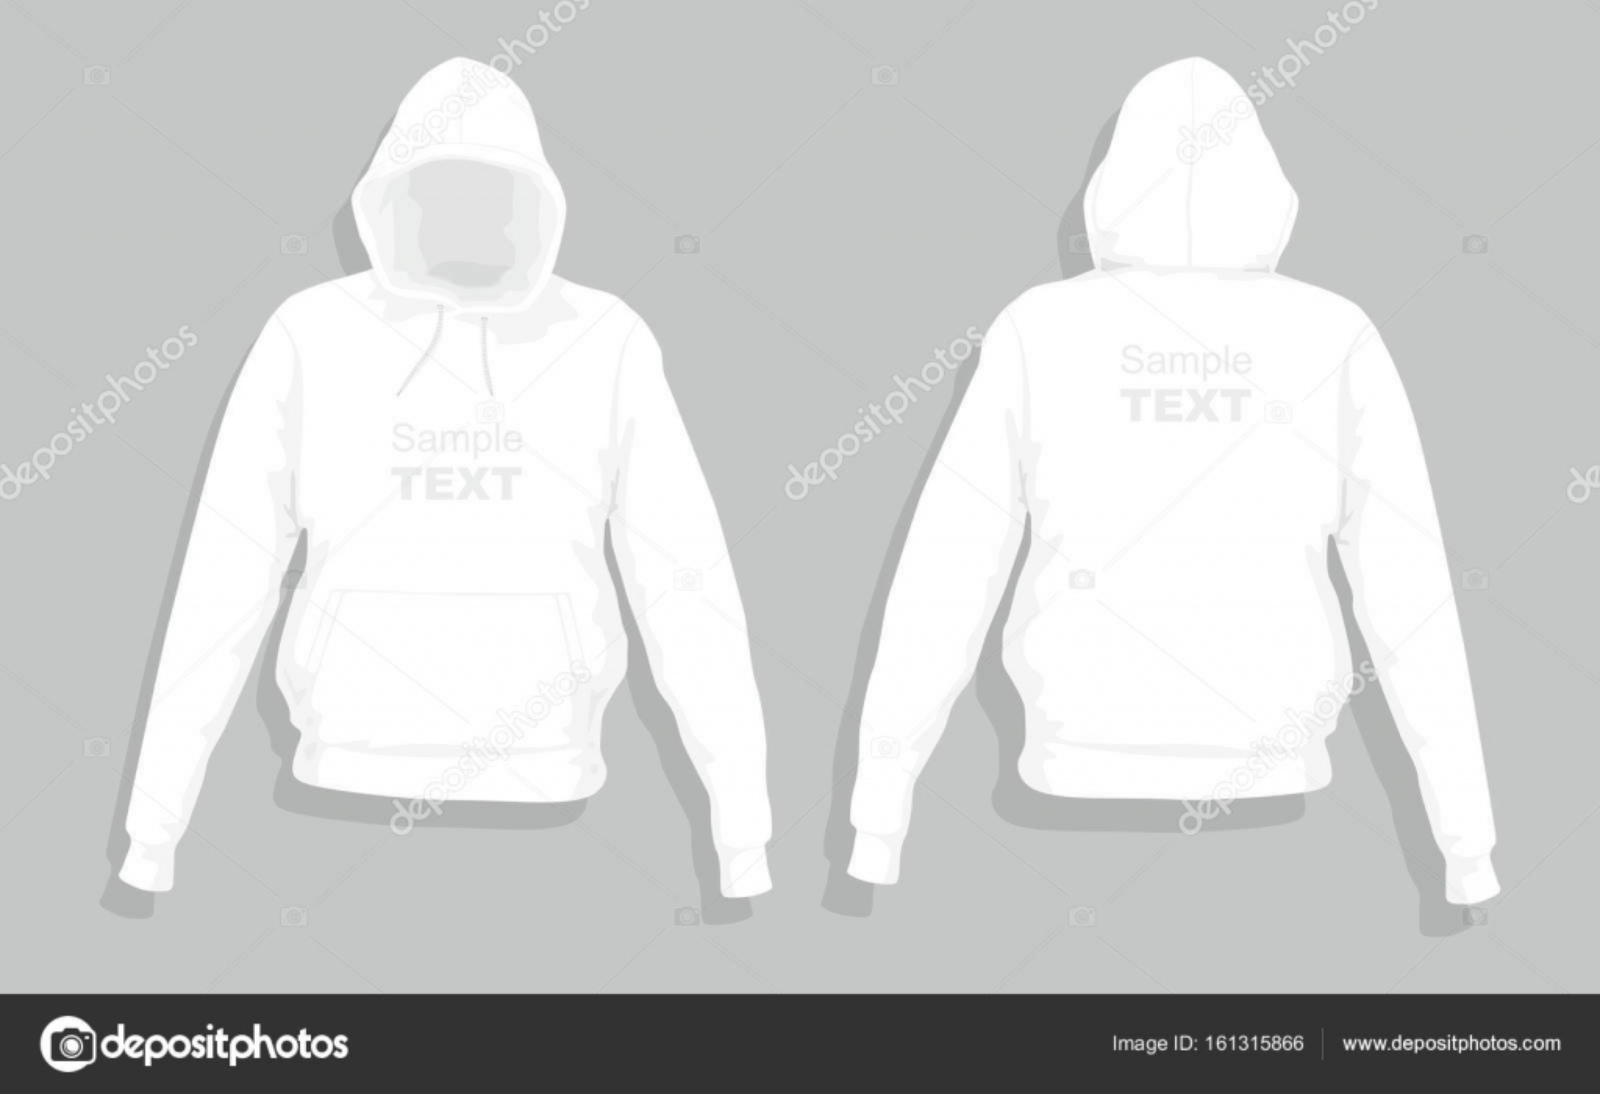 White sweater design template \u2014 Stock Vector © Volykievgenii #161315866